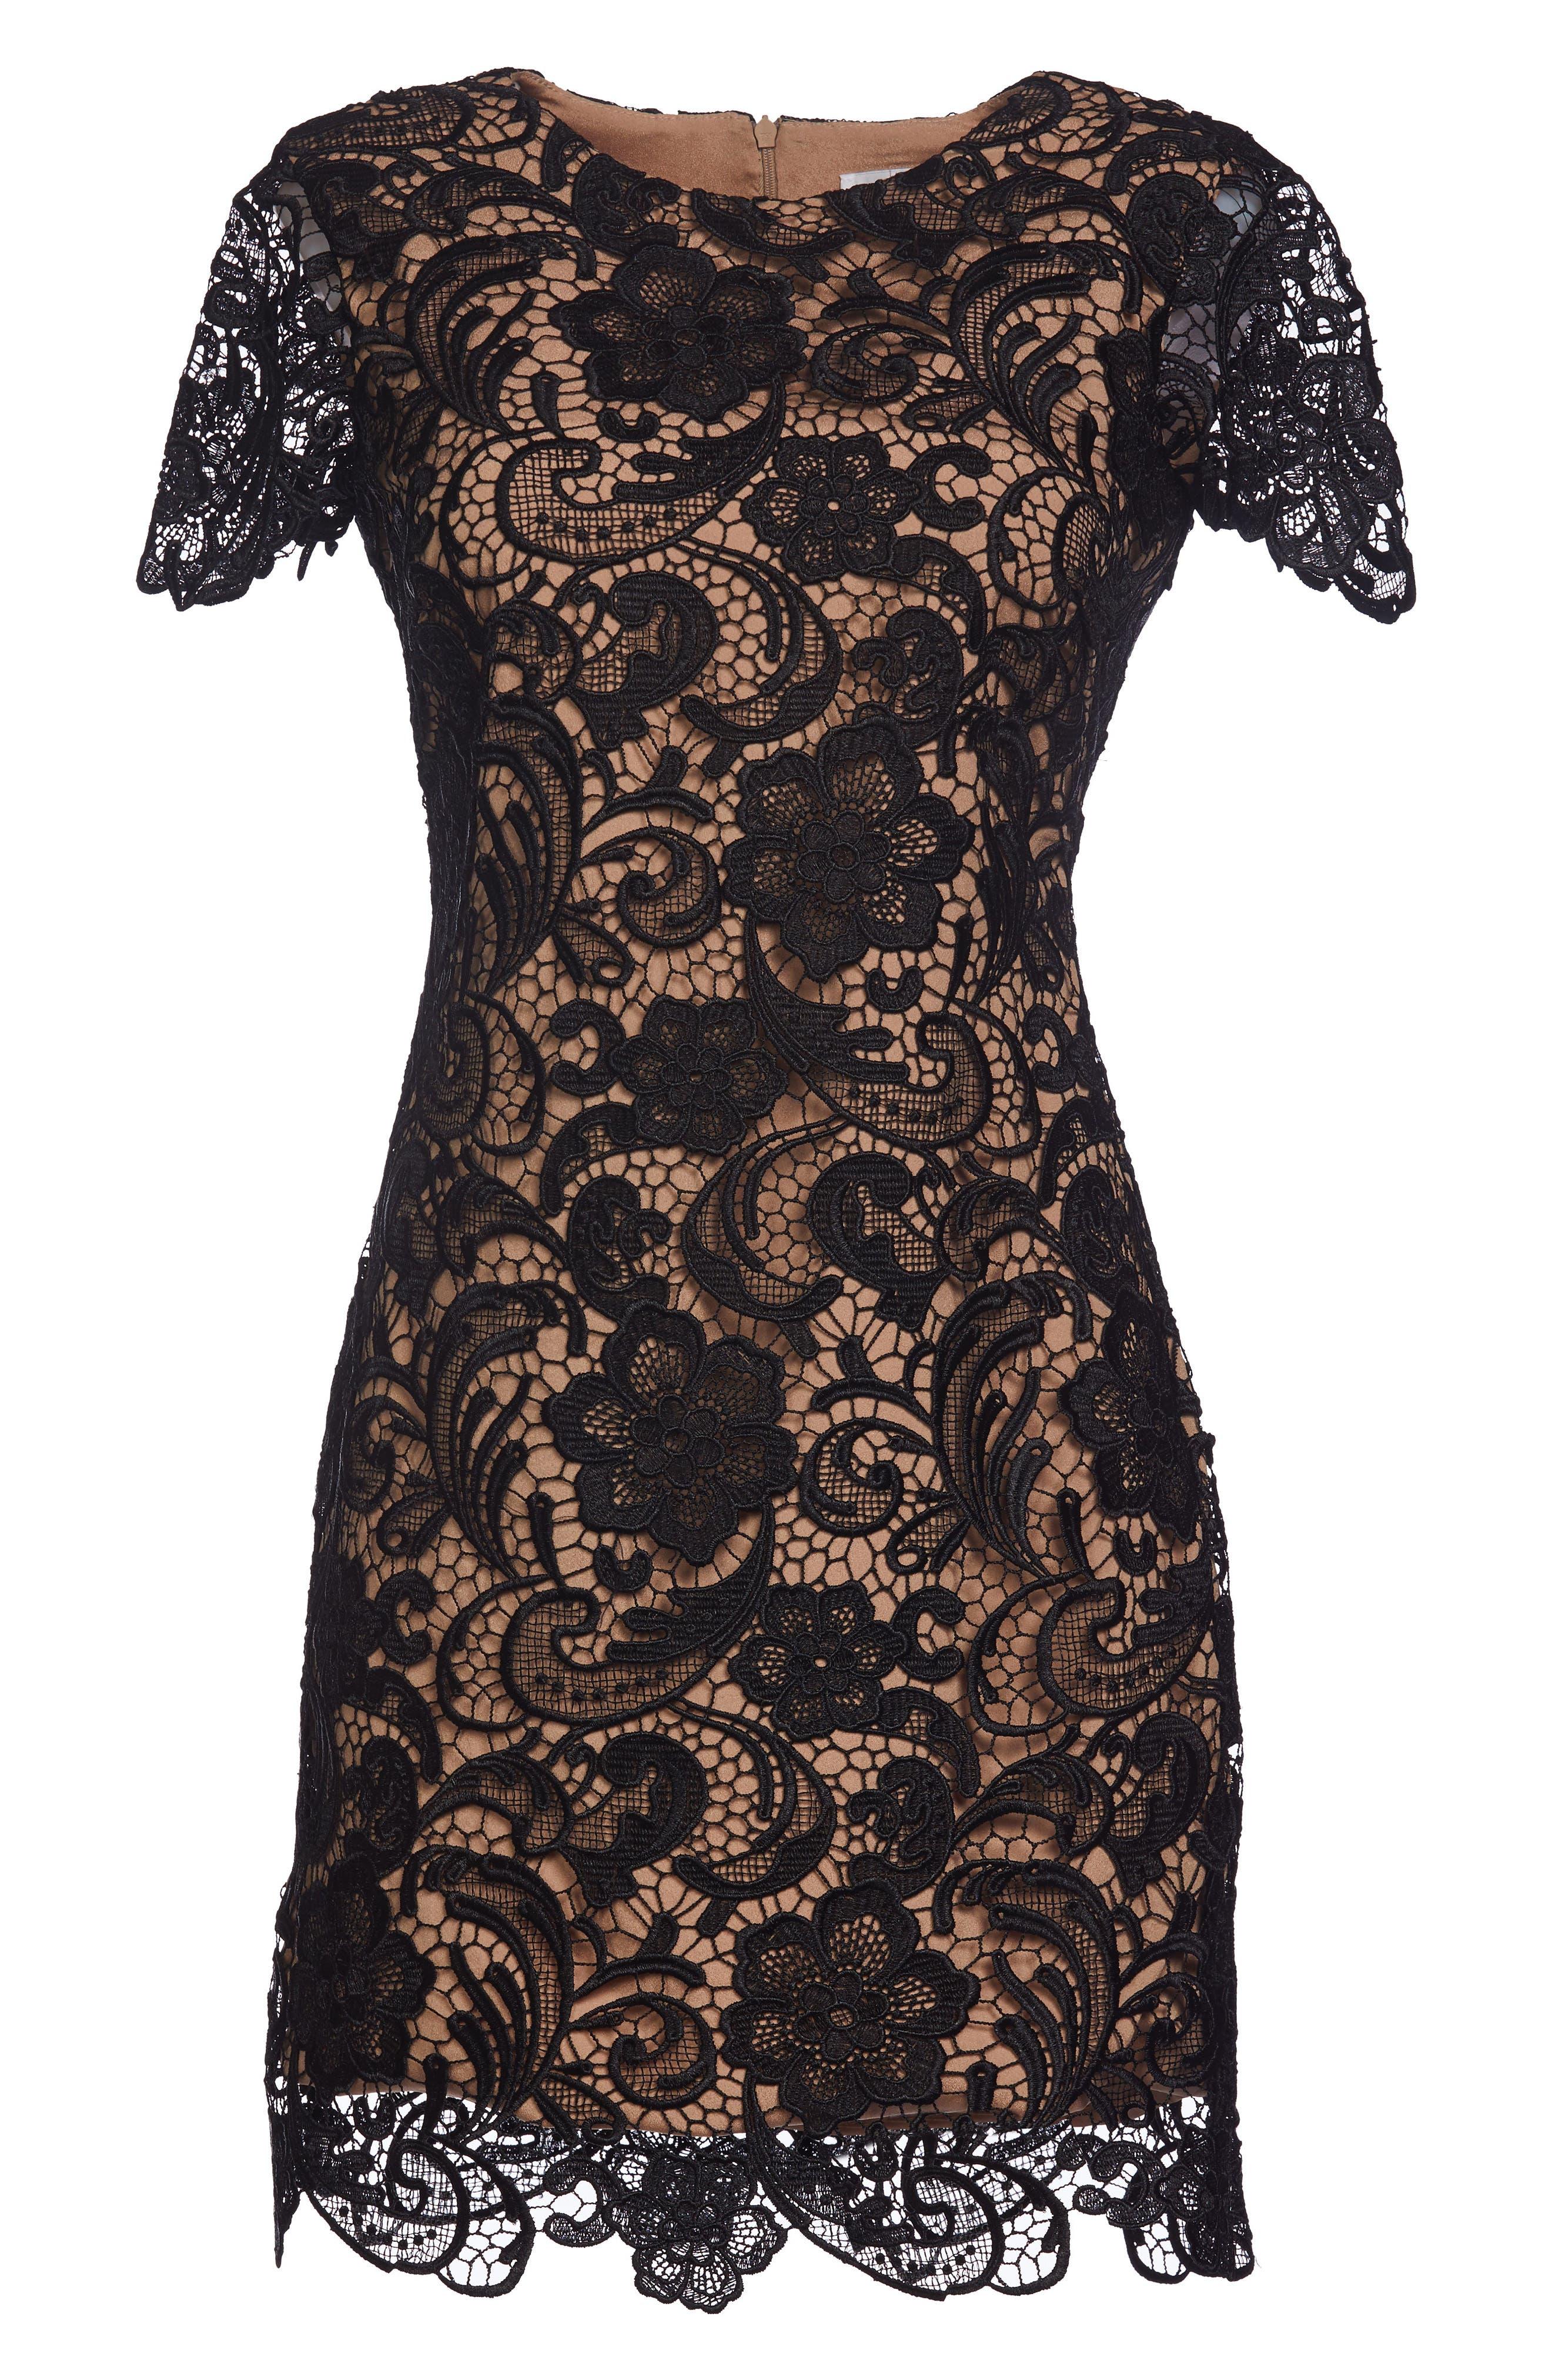 Anna Crochet Lace Sheath Dress,                             Alternate thumbnail 3, color,                             BLACK/ NUDE